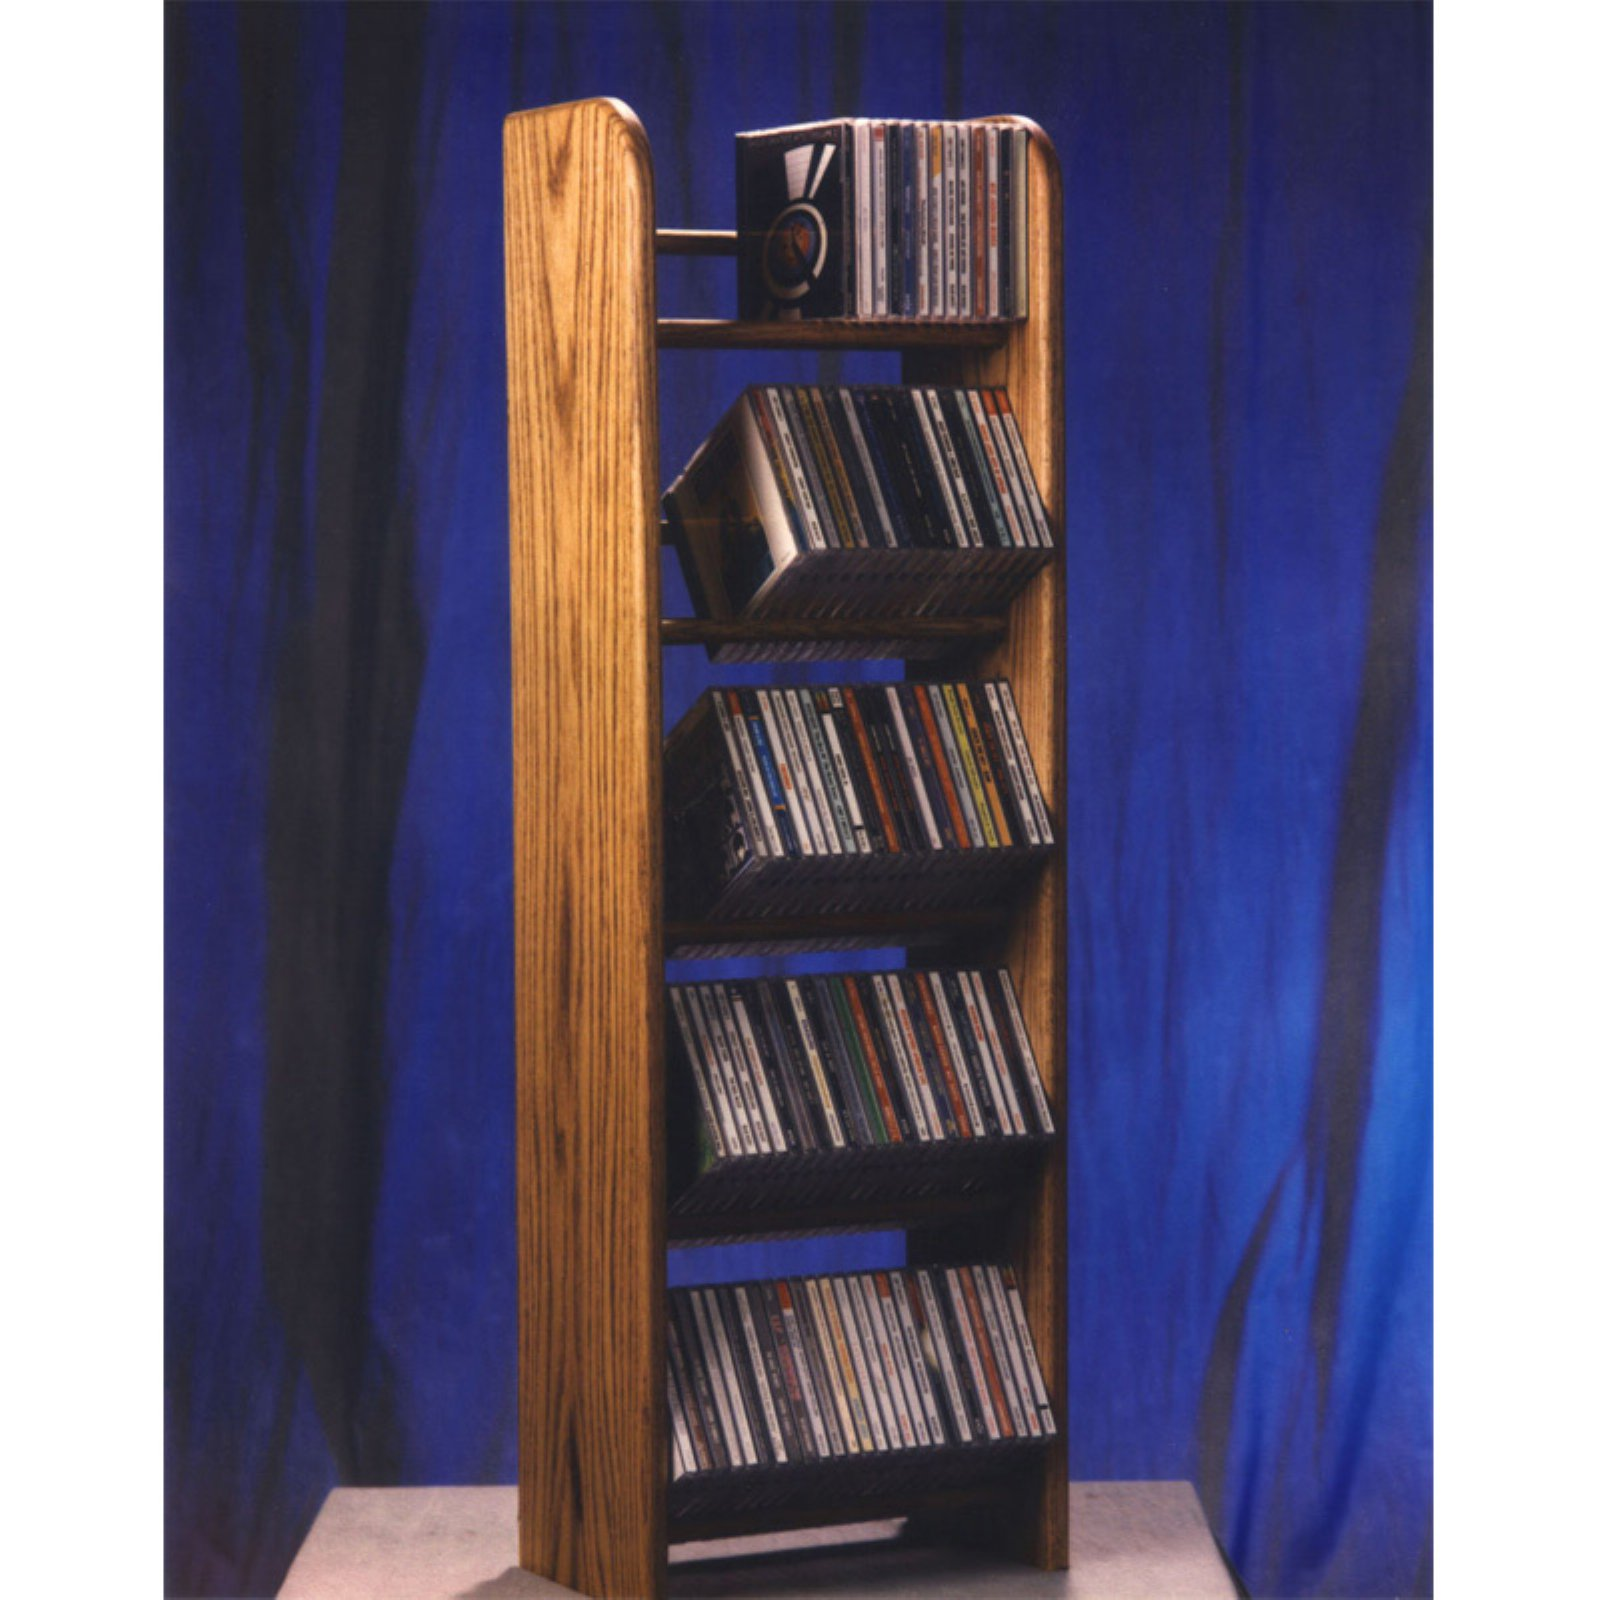 The Wood Shed Solid Oak 5 Row Dowel 130 CD Media Rack